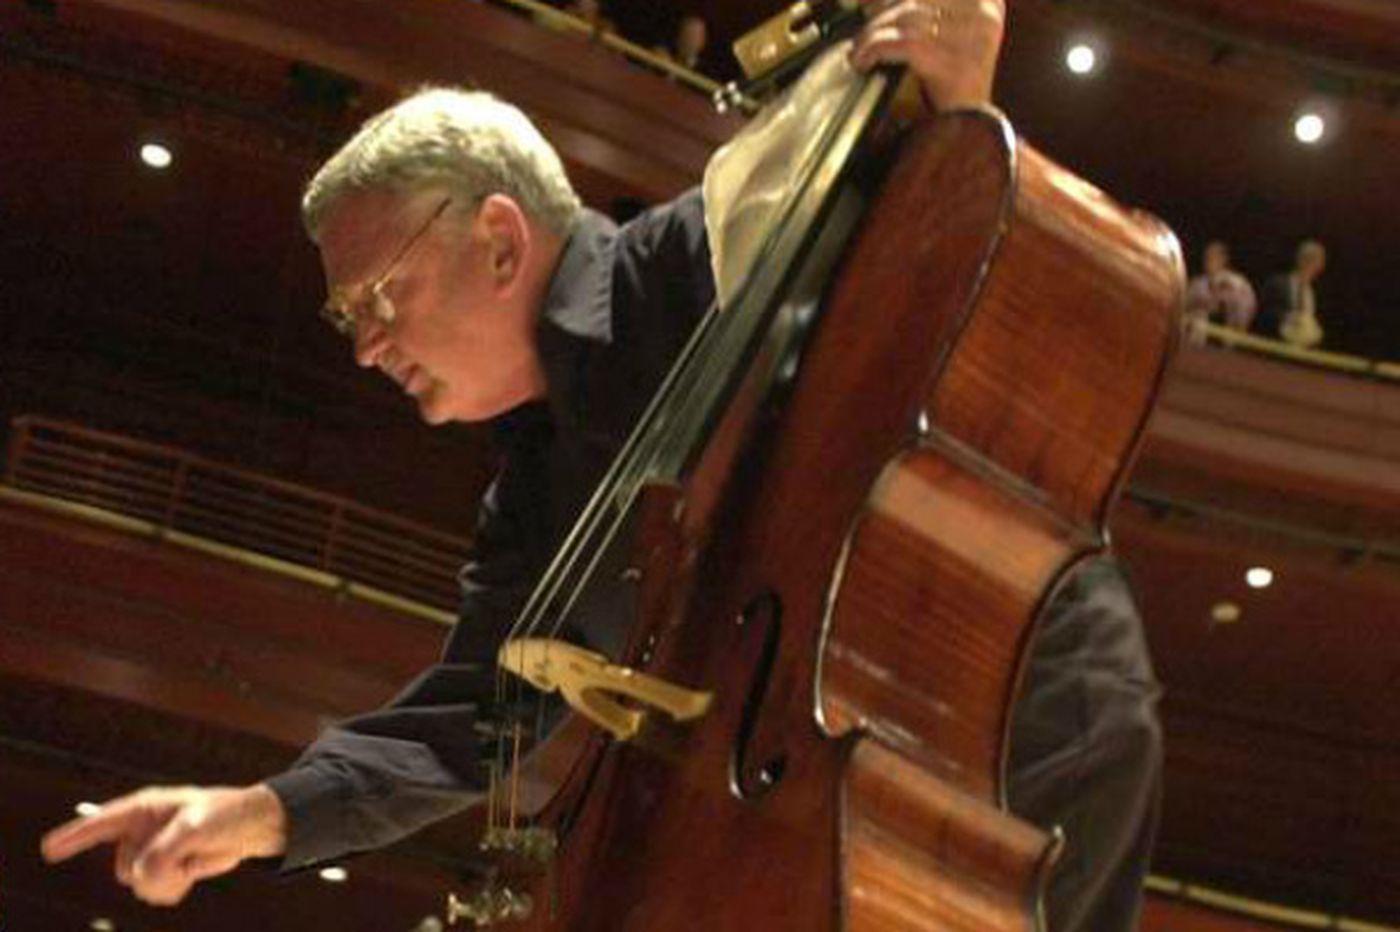 William Stokking, 81, Phila. Orchestra cellist